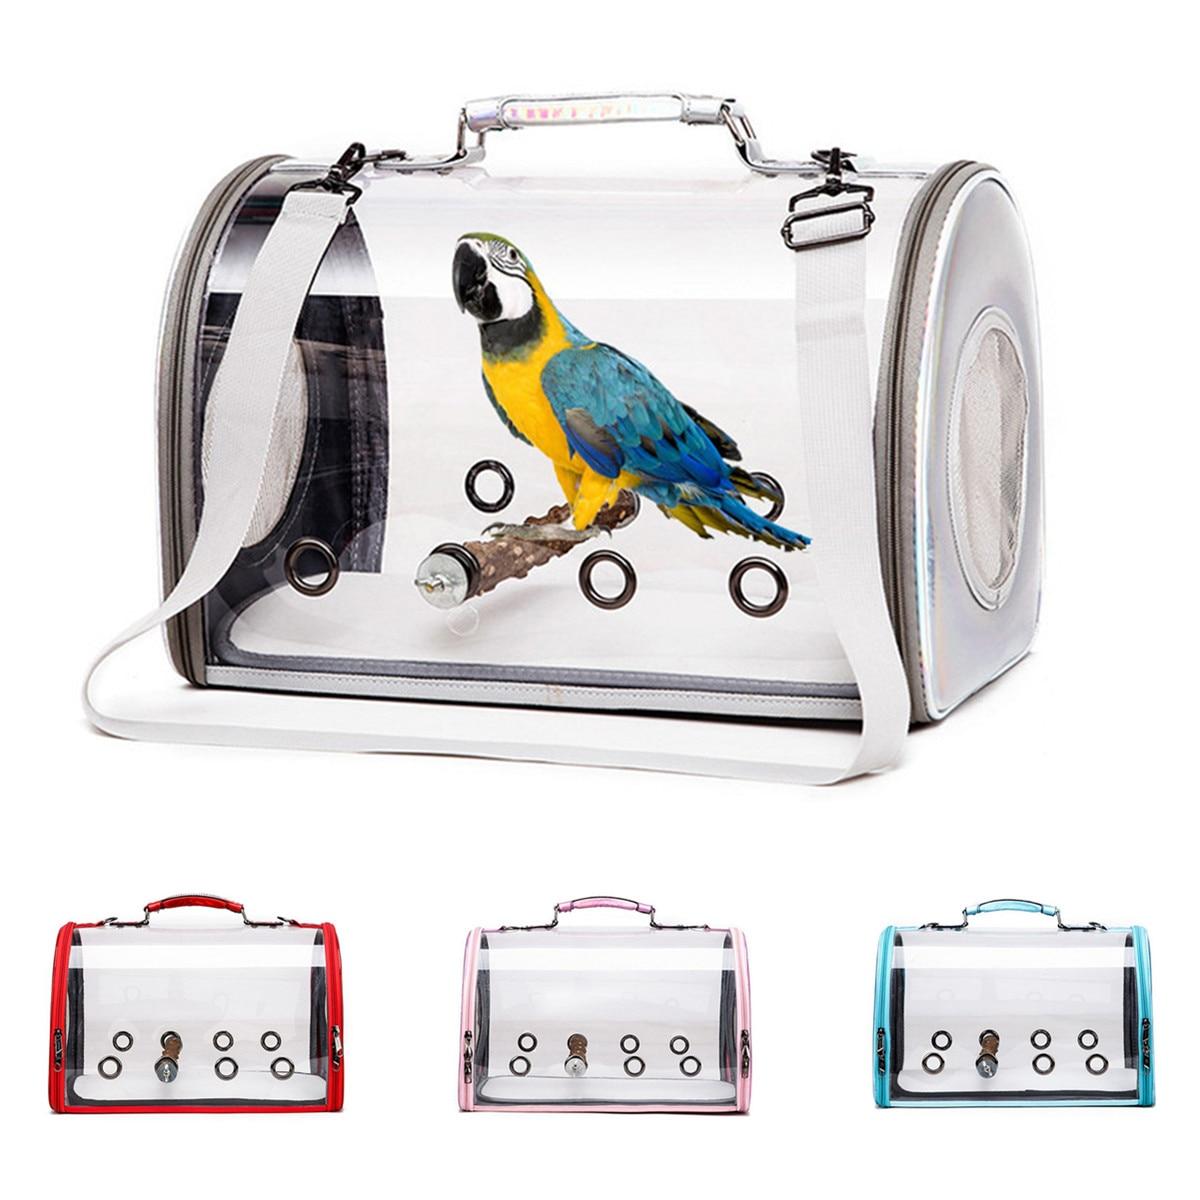 Portabebés portabebés para mascotas, transparente, transpirable, bolsa de viaje, bolsa de mano para loro, bolso de viaje para pájaros al aire libre, bolsa de viaje